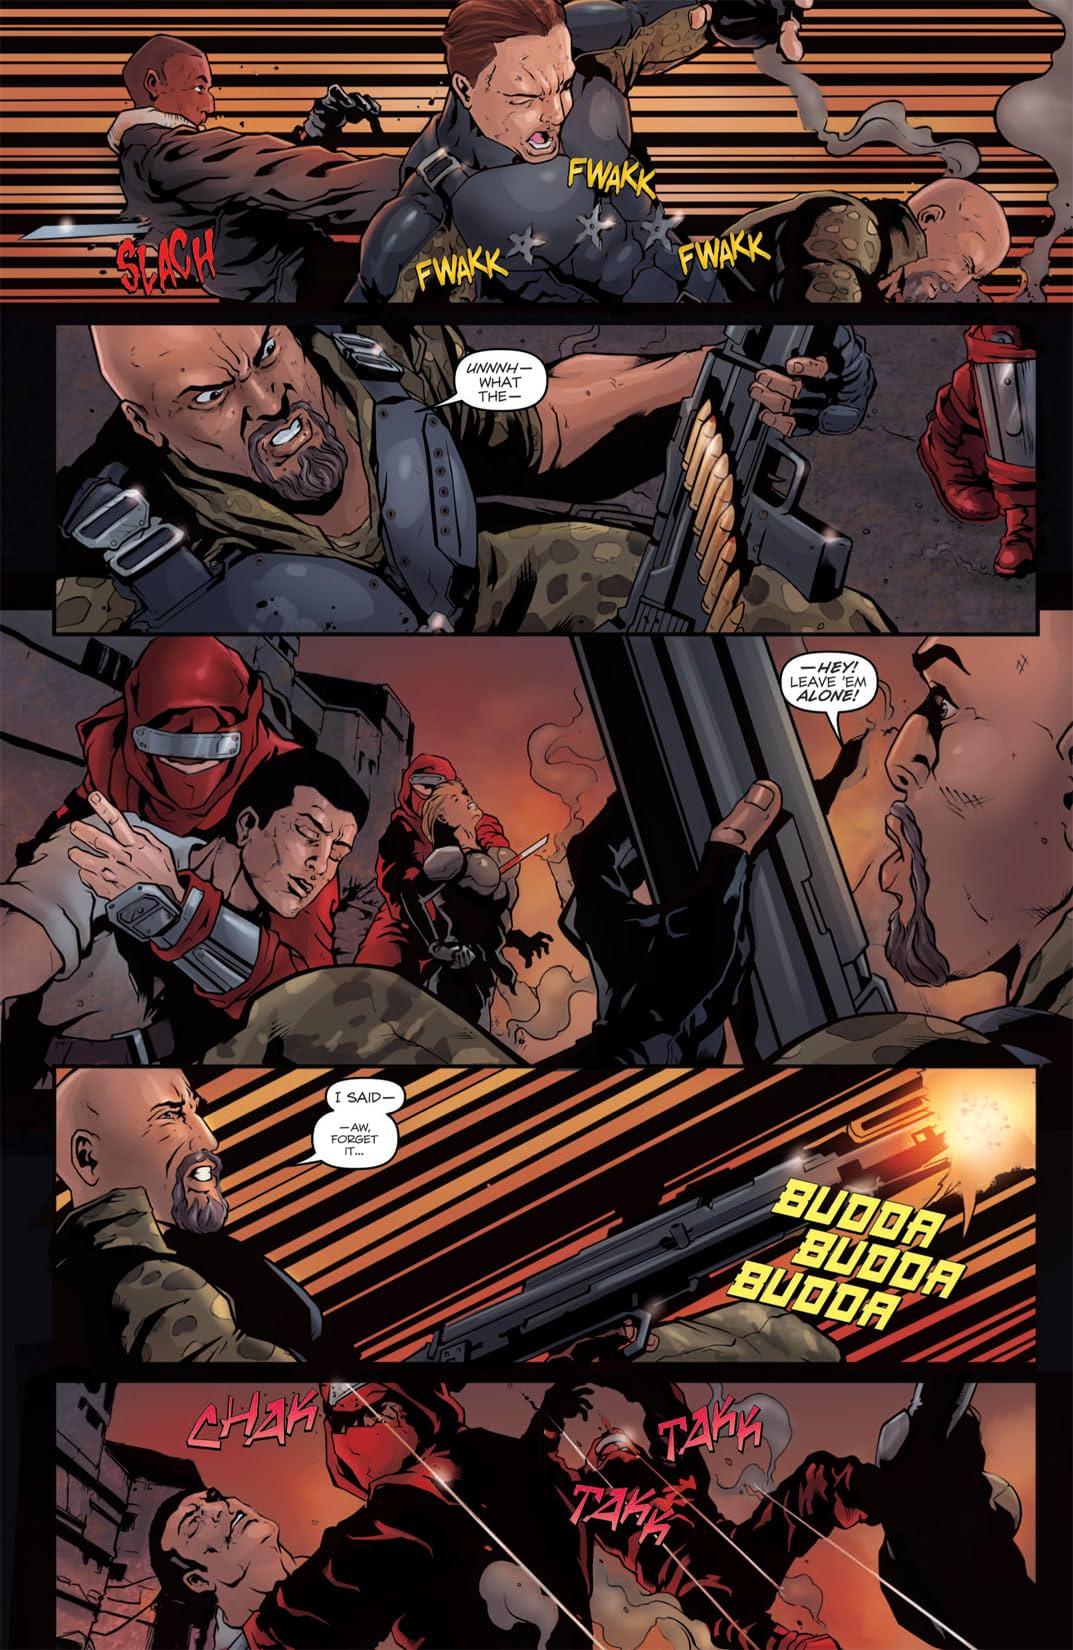 G.I. Joe 2: Movie Prequel - Retaliation